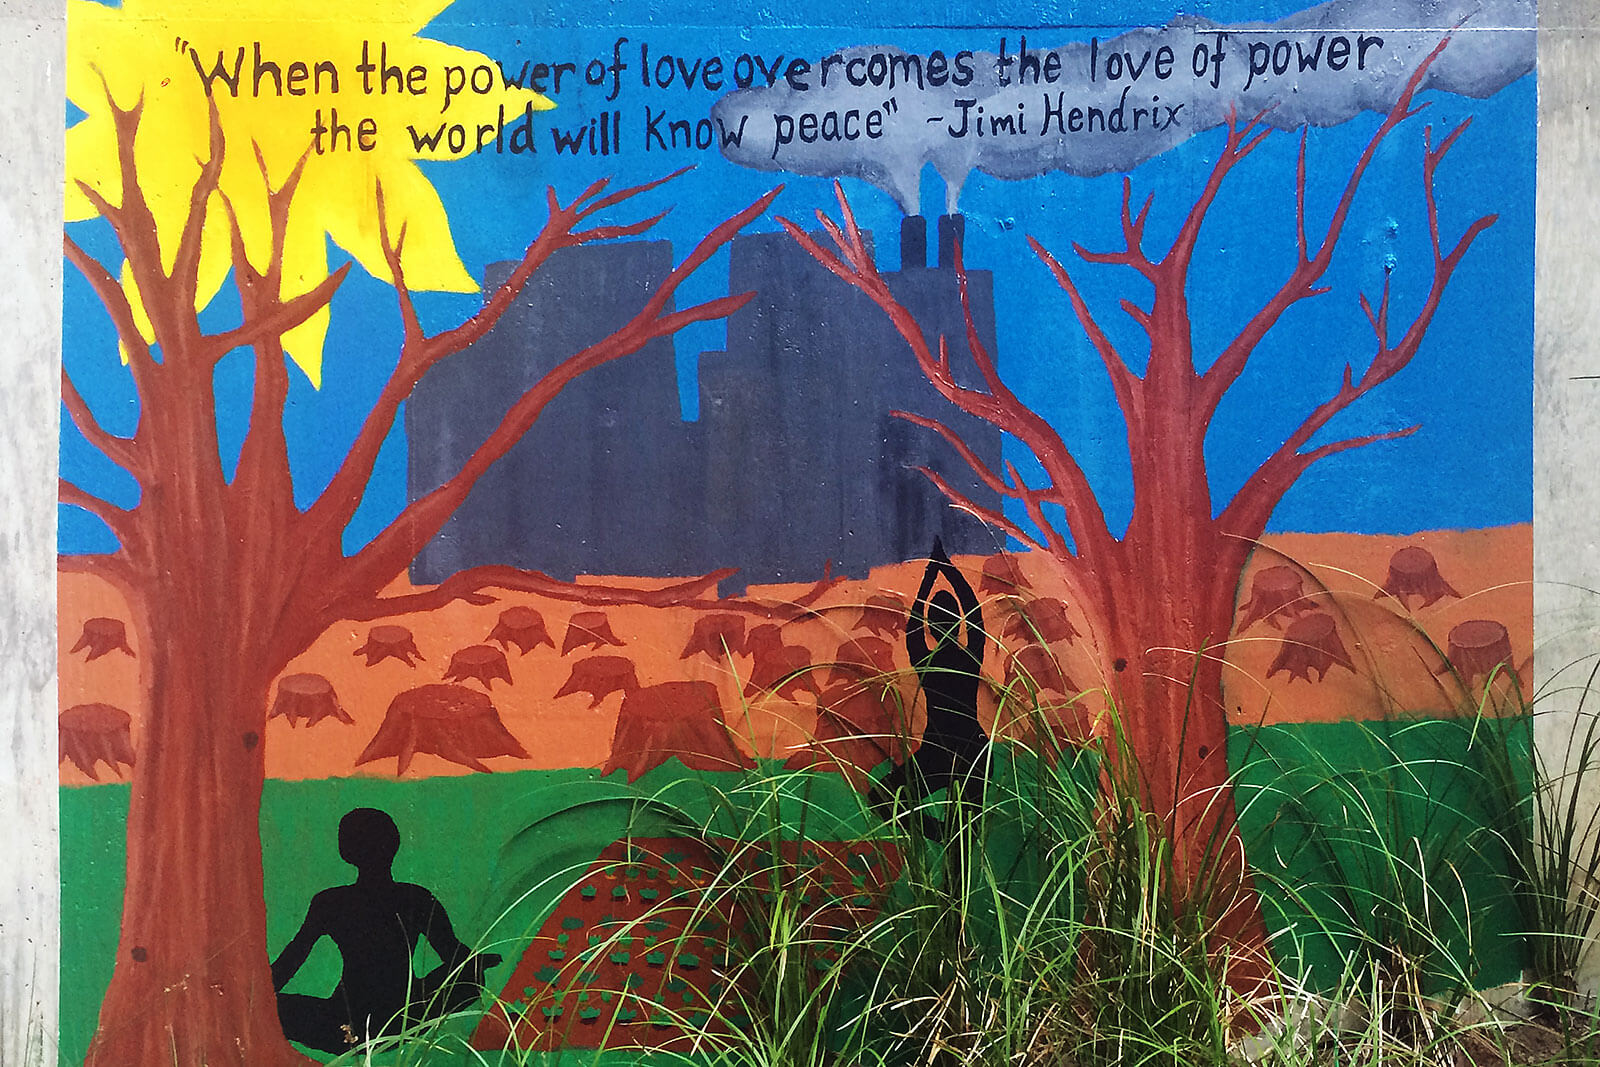 Mural com frase de Jimi Hendrix